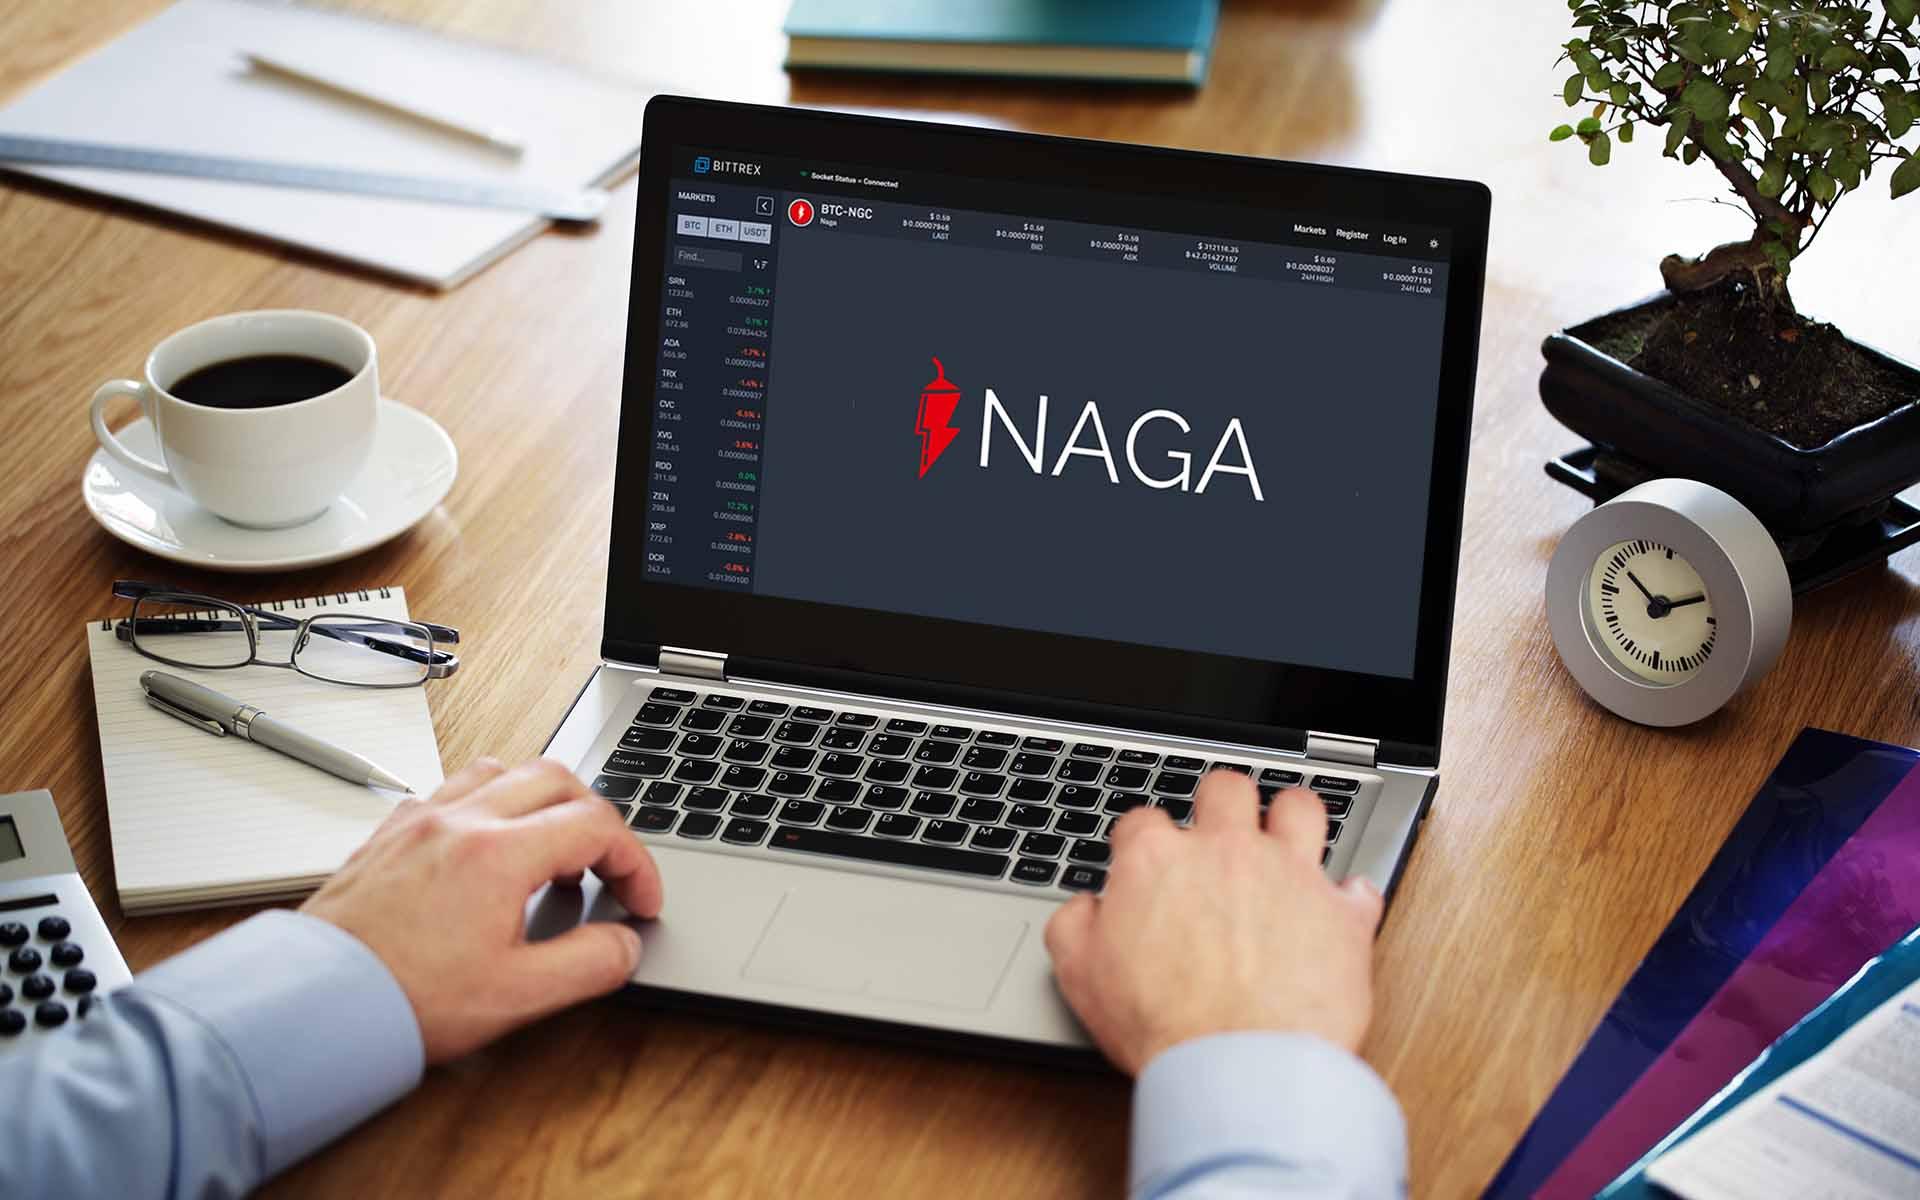 NAGA Coin (NGC) Now Listed on Bittrex